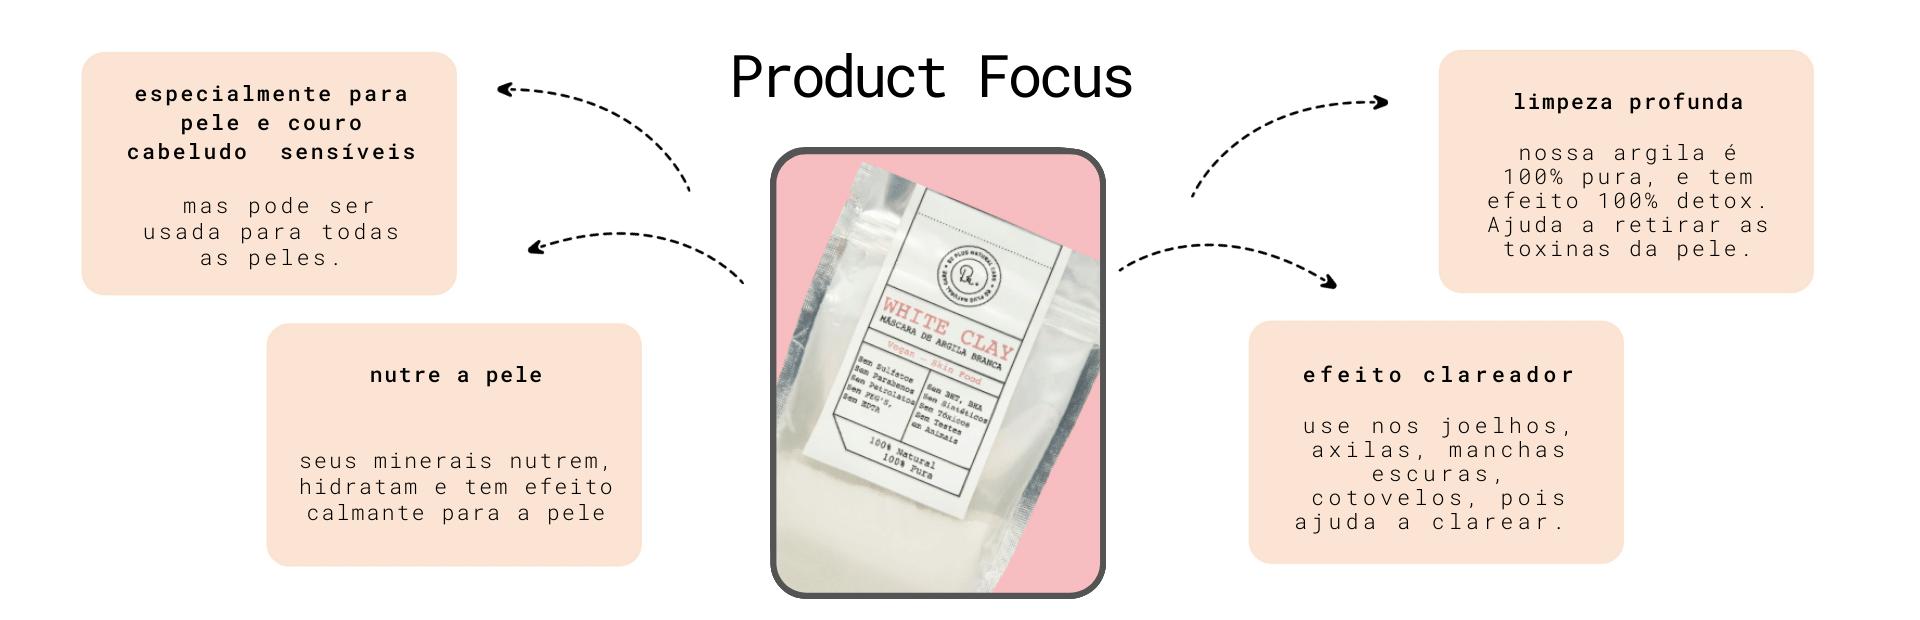 [Banner produto] argila branca